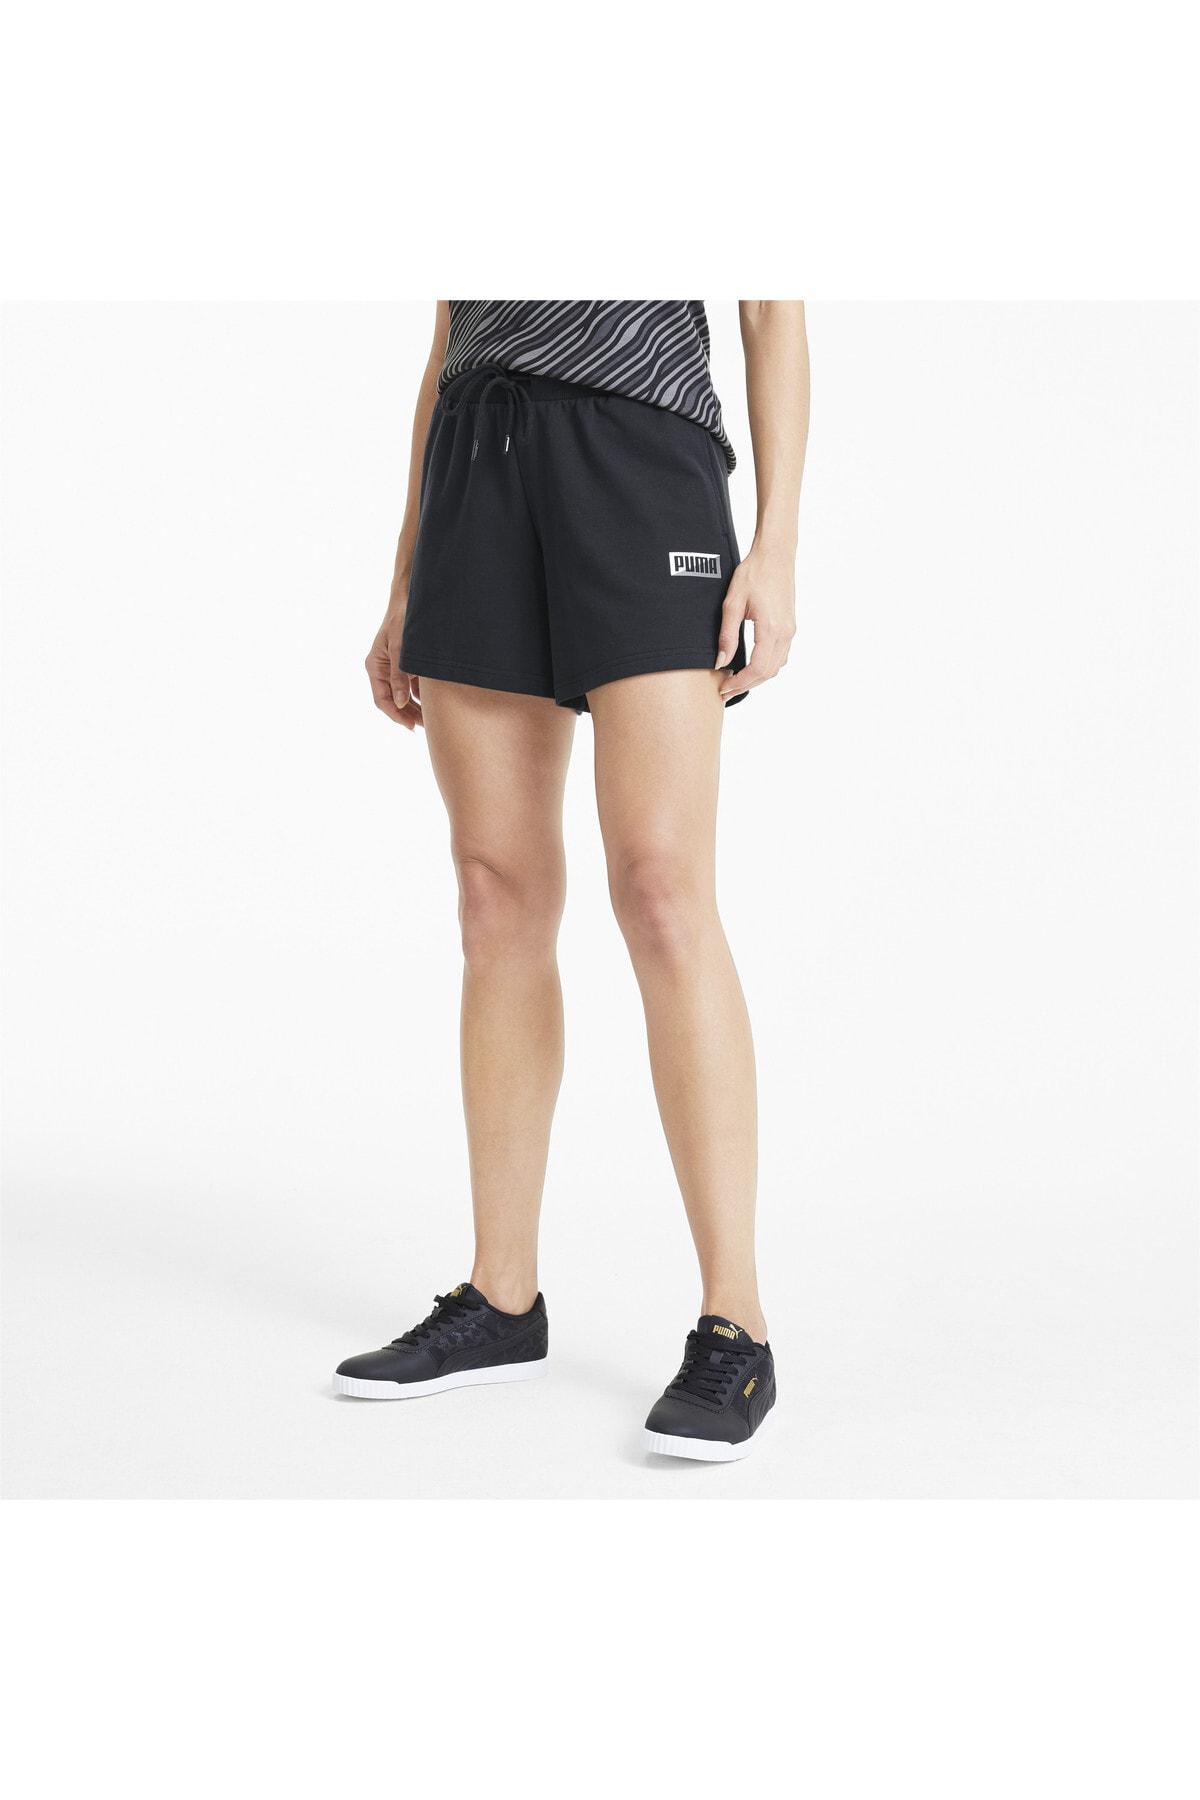 Puma Kadın Spor Şort - SUMMER PRINT - 58417301